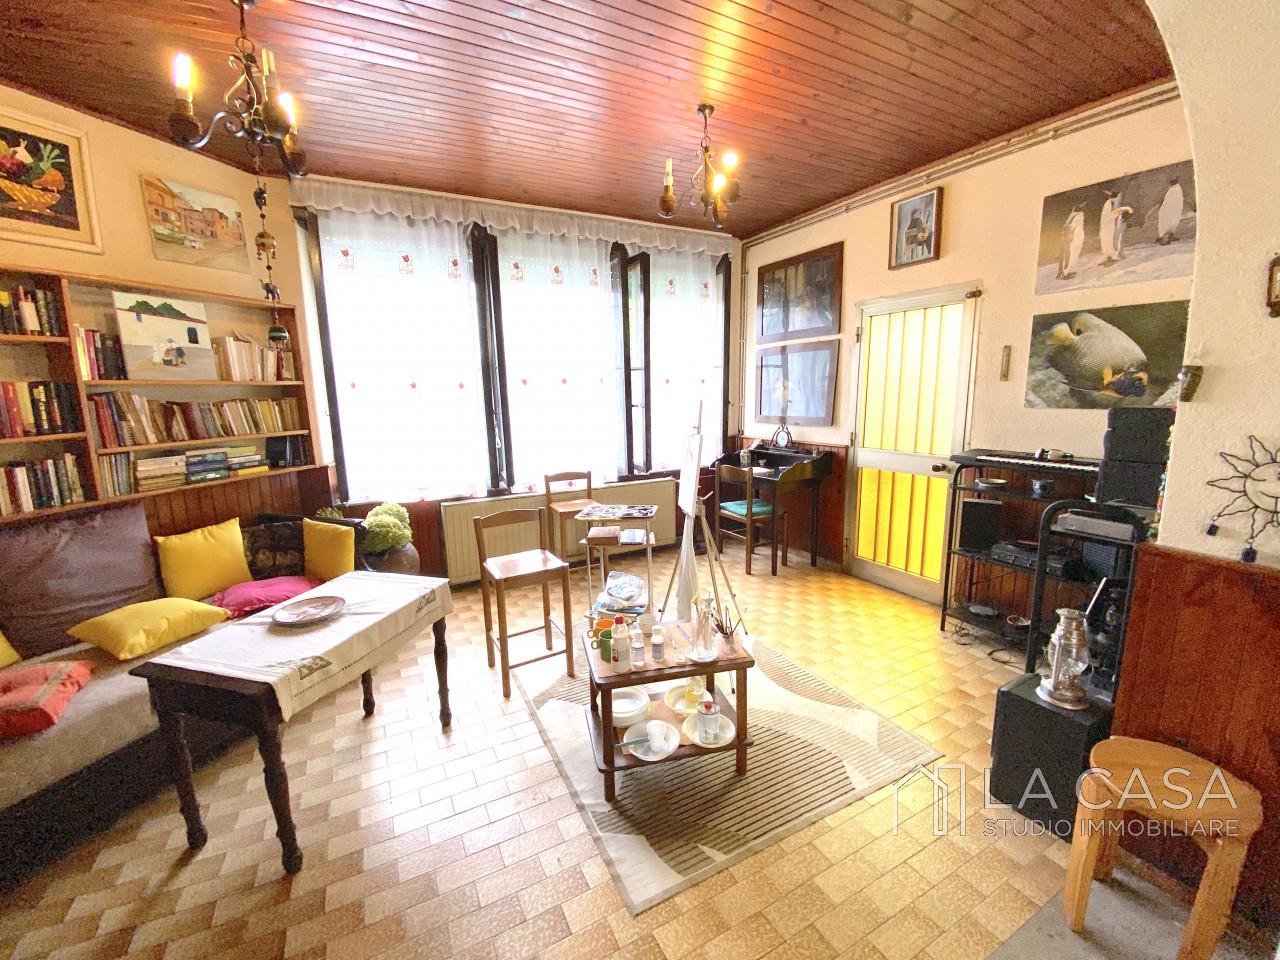 Palazzo plurifamiliare in vendita a Valvasone Arzene - Rif. P3 https://images.gestionaleimmobiliare.it/foto/annunci/200827/2284141/1280x1280/005__img_3694_wmk_0.jpg